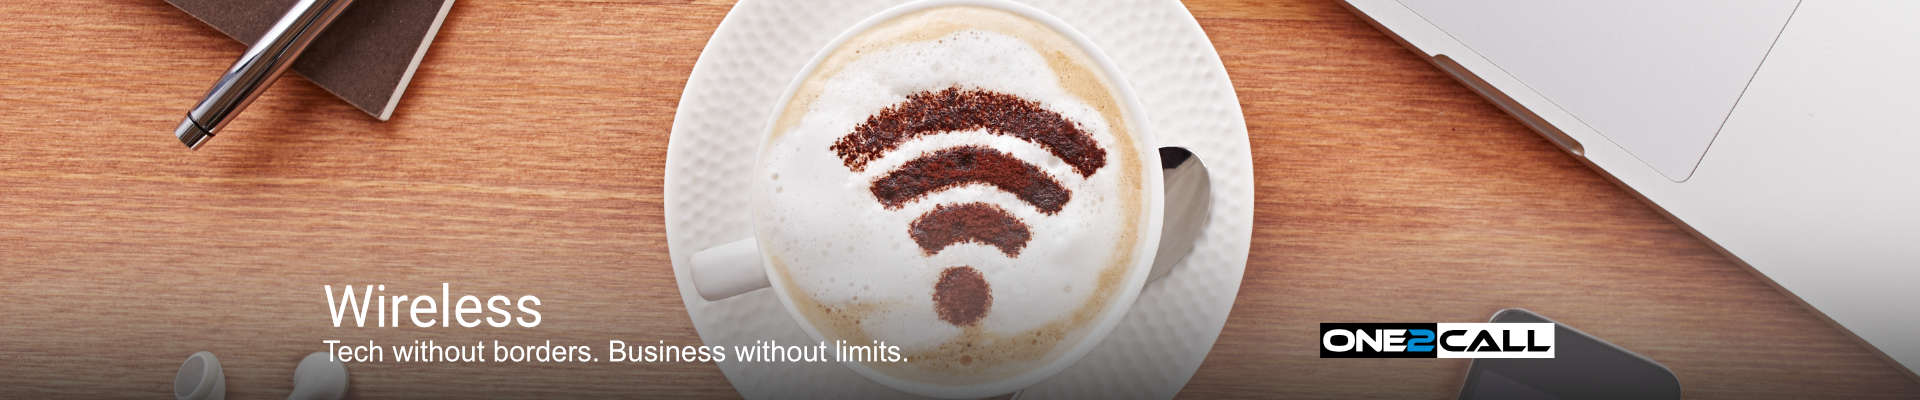 Wireless - Tech without boarders.